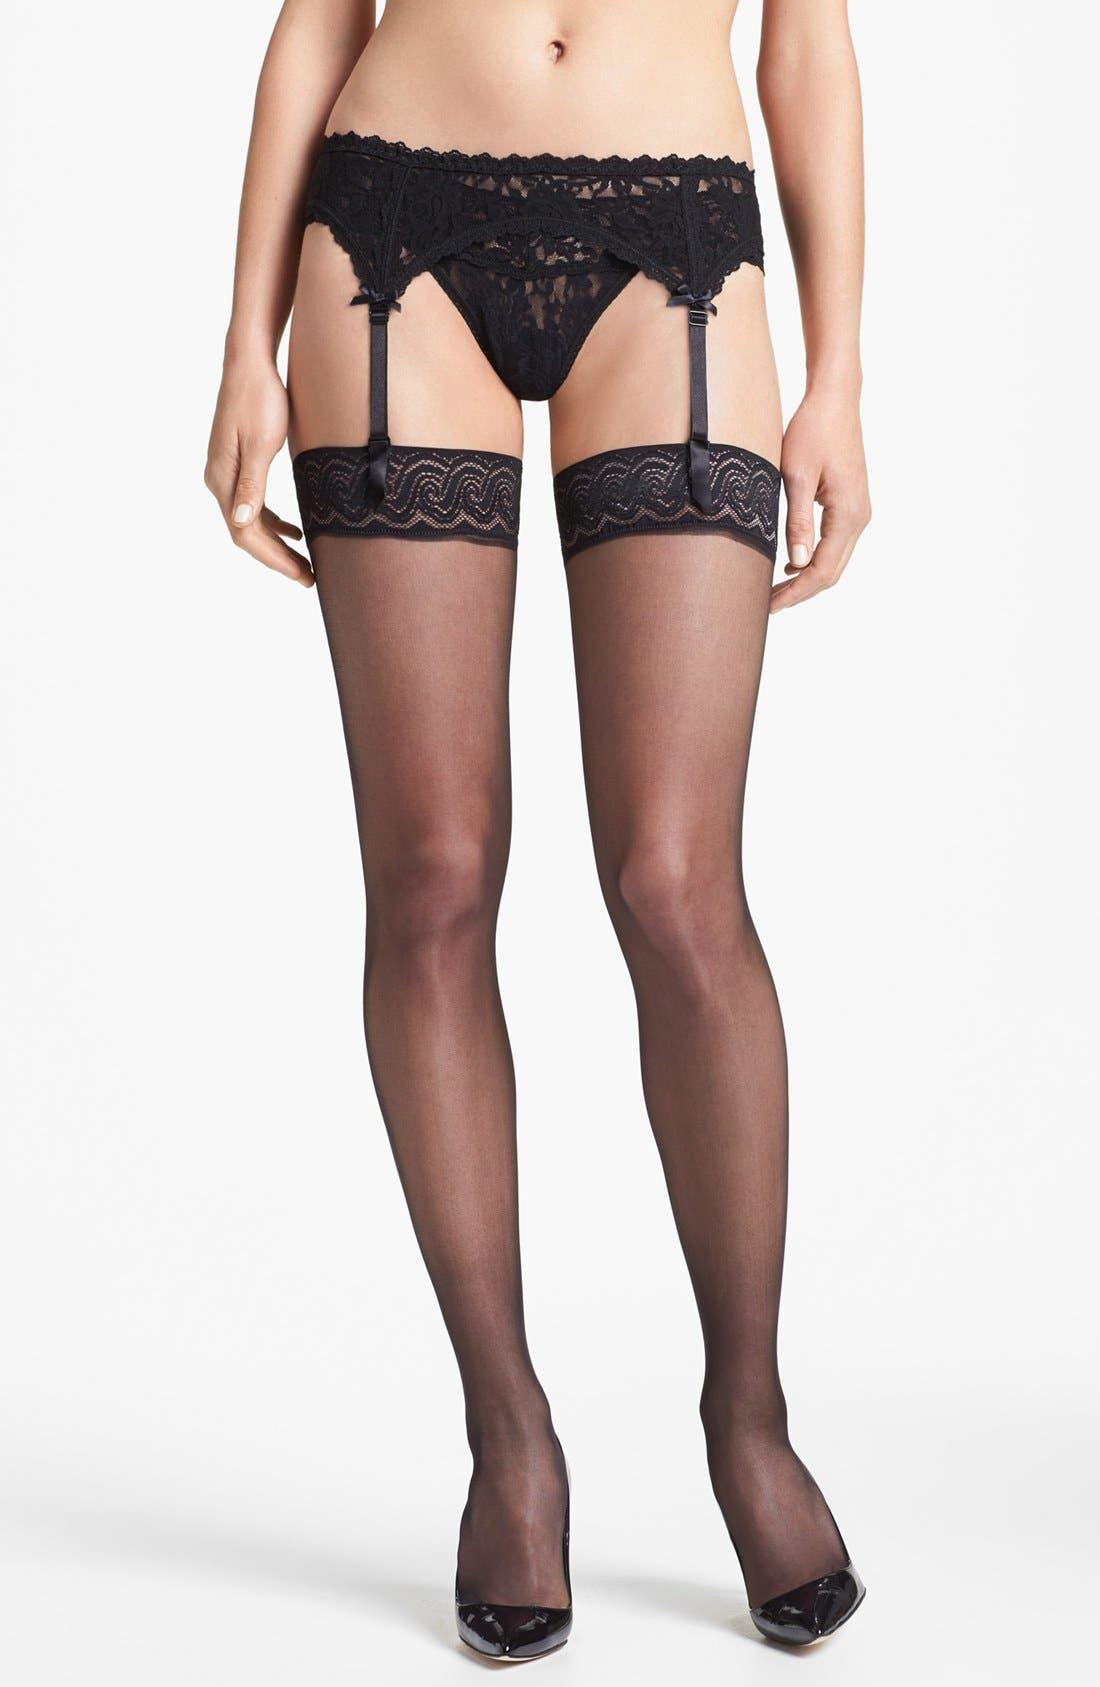 Main Image - Pretty Polly 10 Denier Gloss Thigh High Stockings